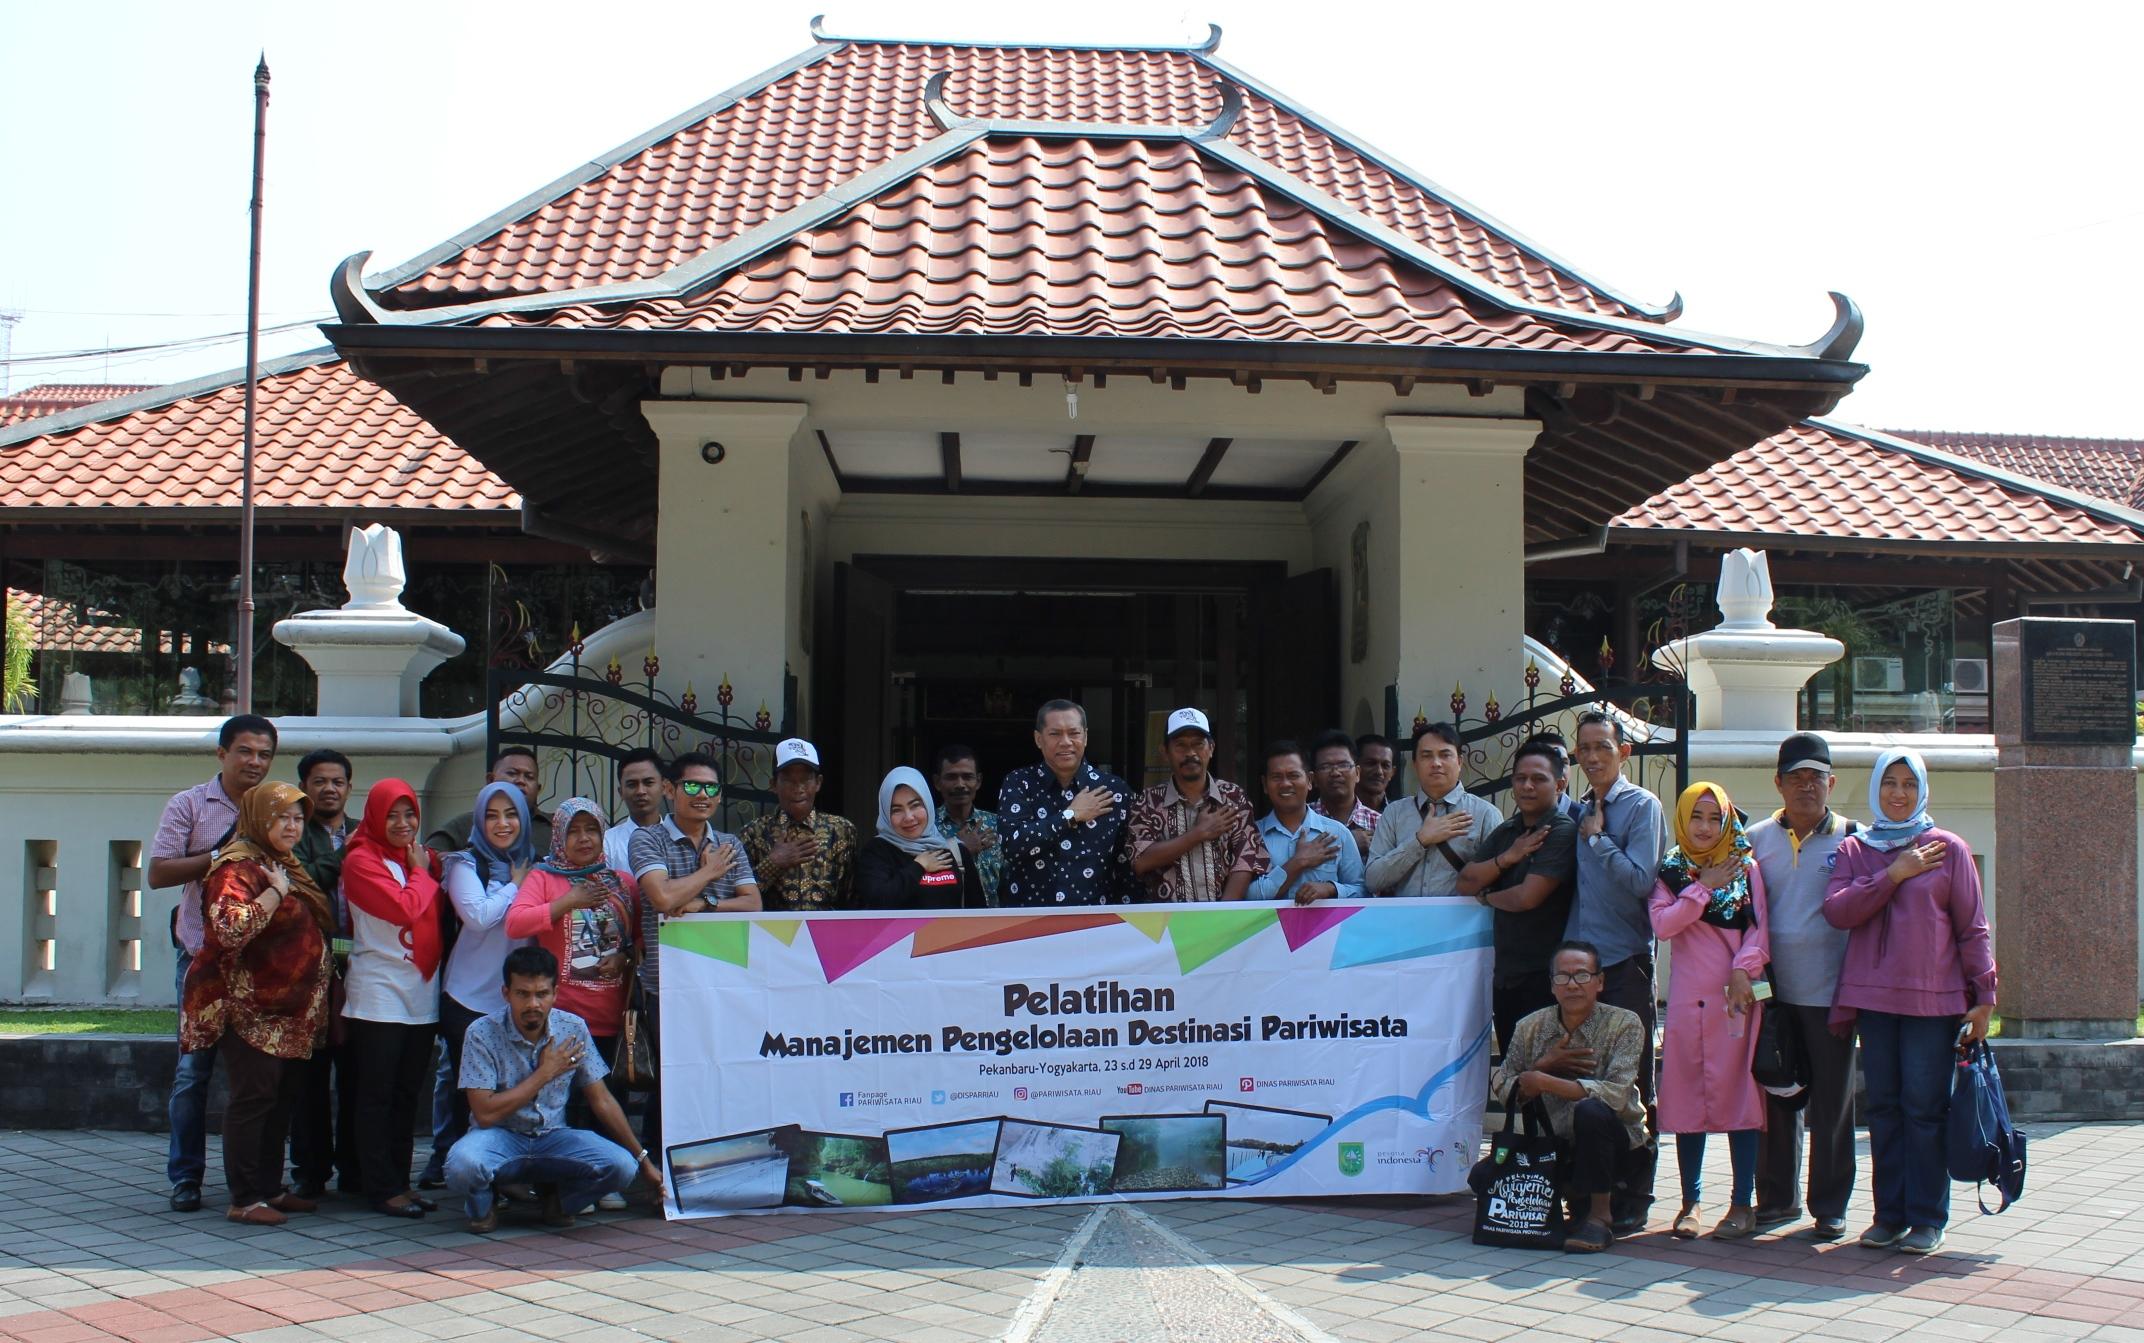 Museum Sonobudoyo Yogyakarta Alt Unit Galeri Kota